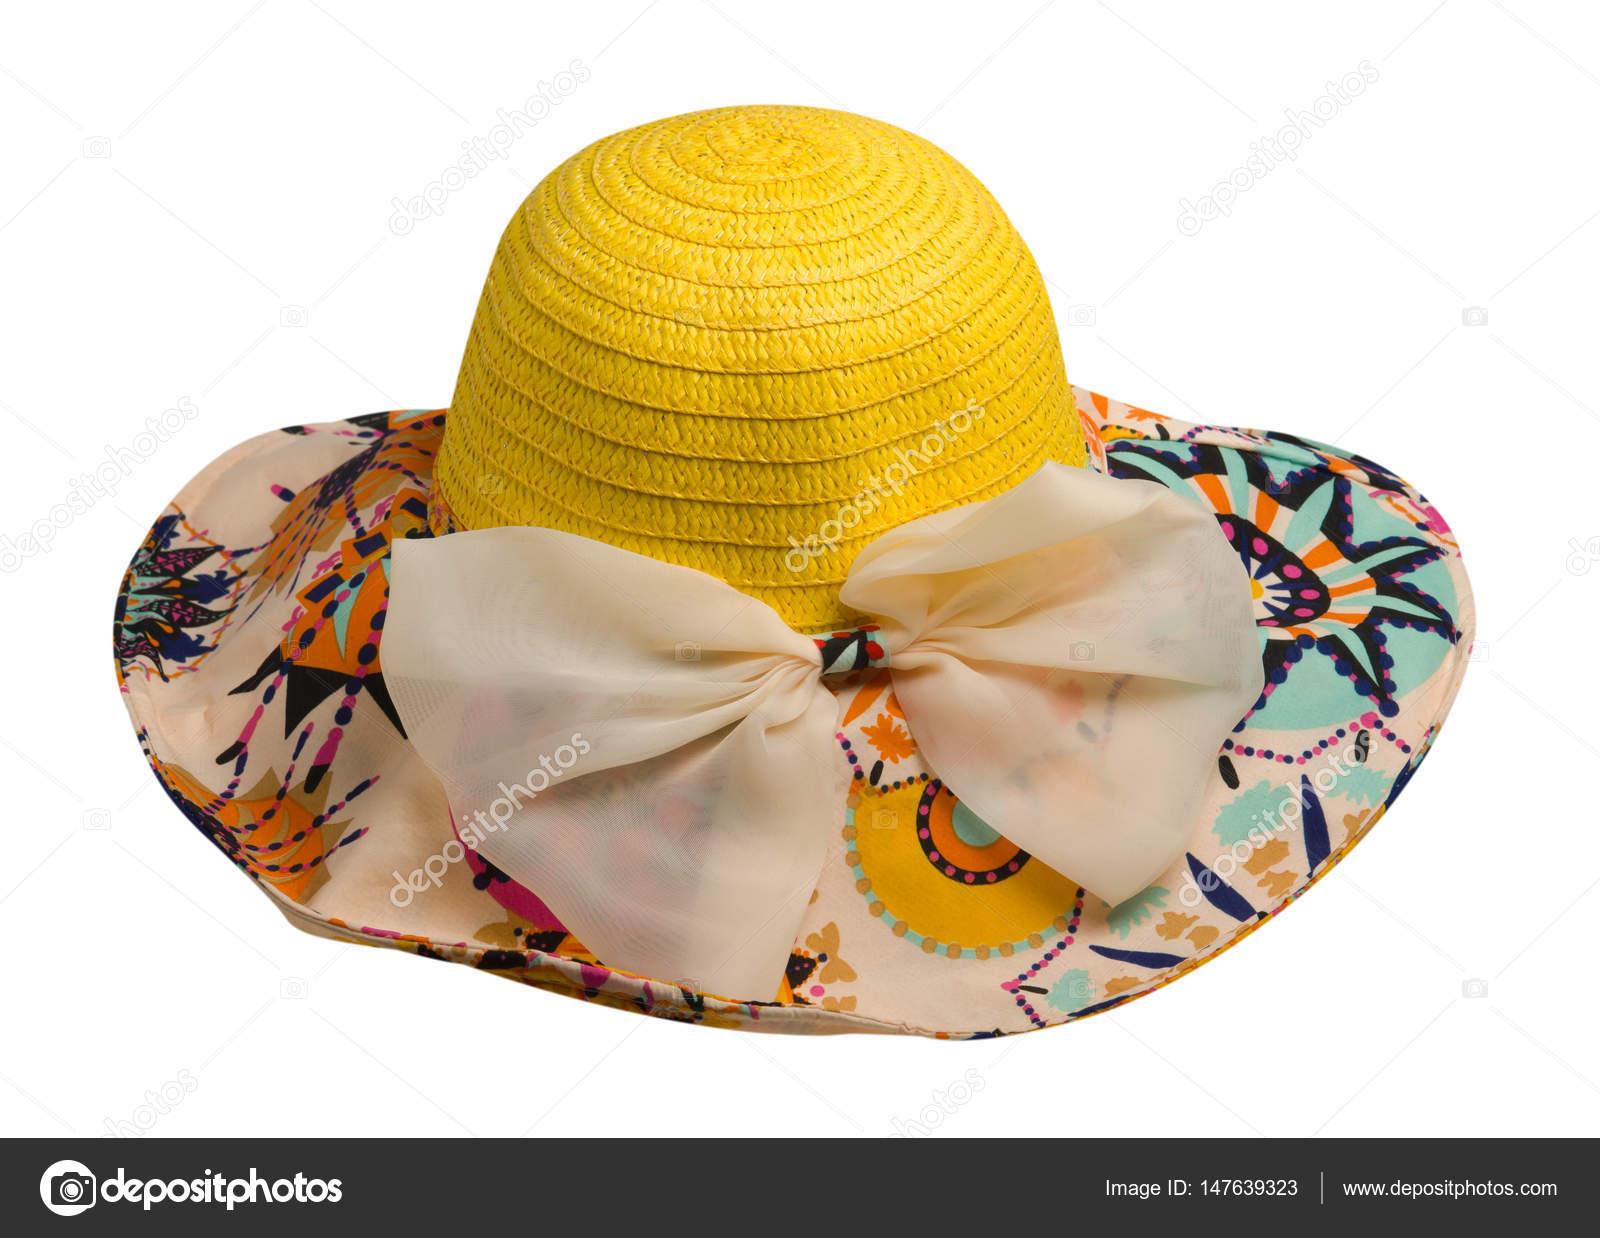 f3360ee50a Γυναίκα καπέλο που απομονώνονται σε λευκό φόντο. Κίτρινο γυναικών παραλία  .women καπέλο του καπέλο παραλία με φιόγκο — Εικόνα από ...